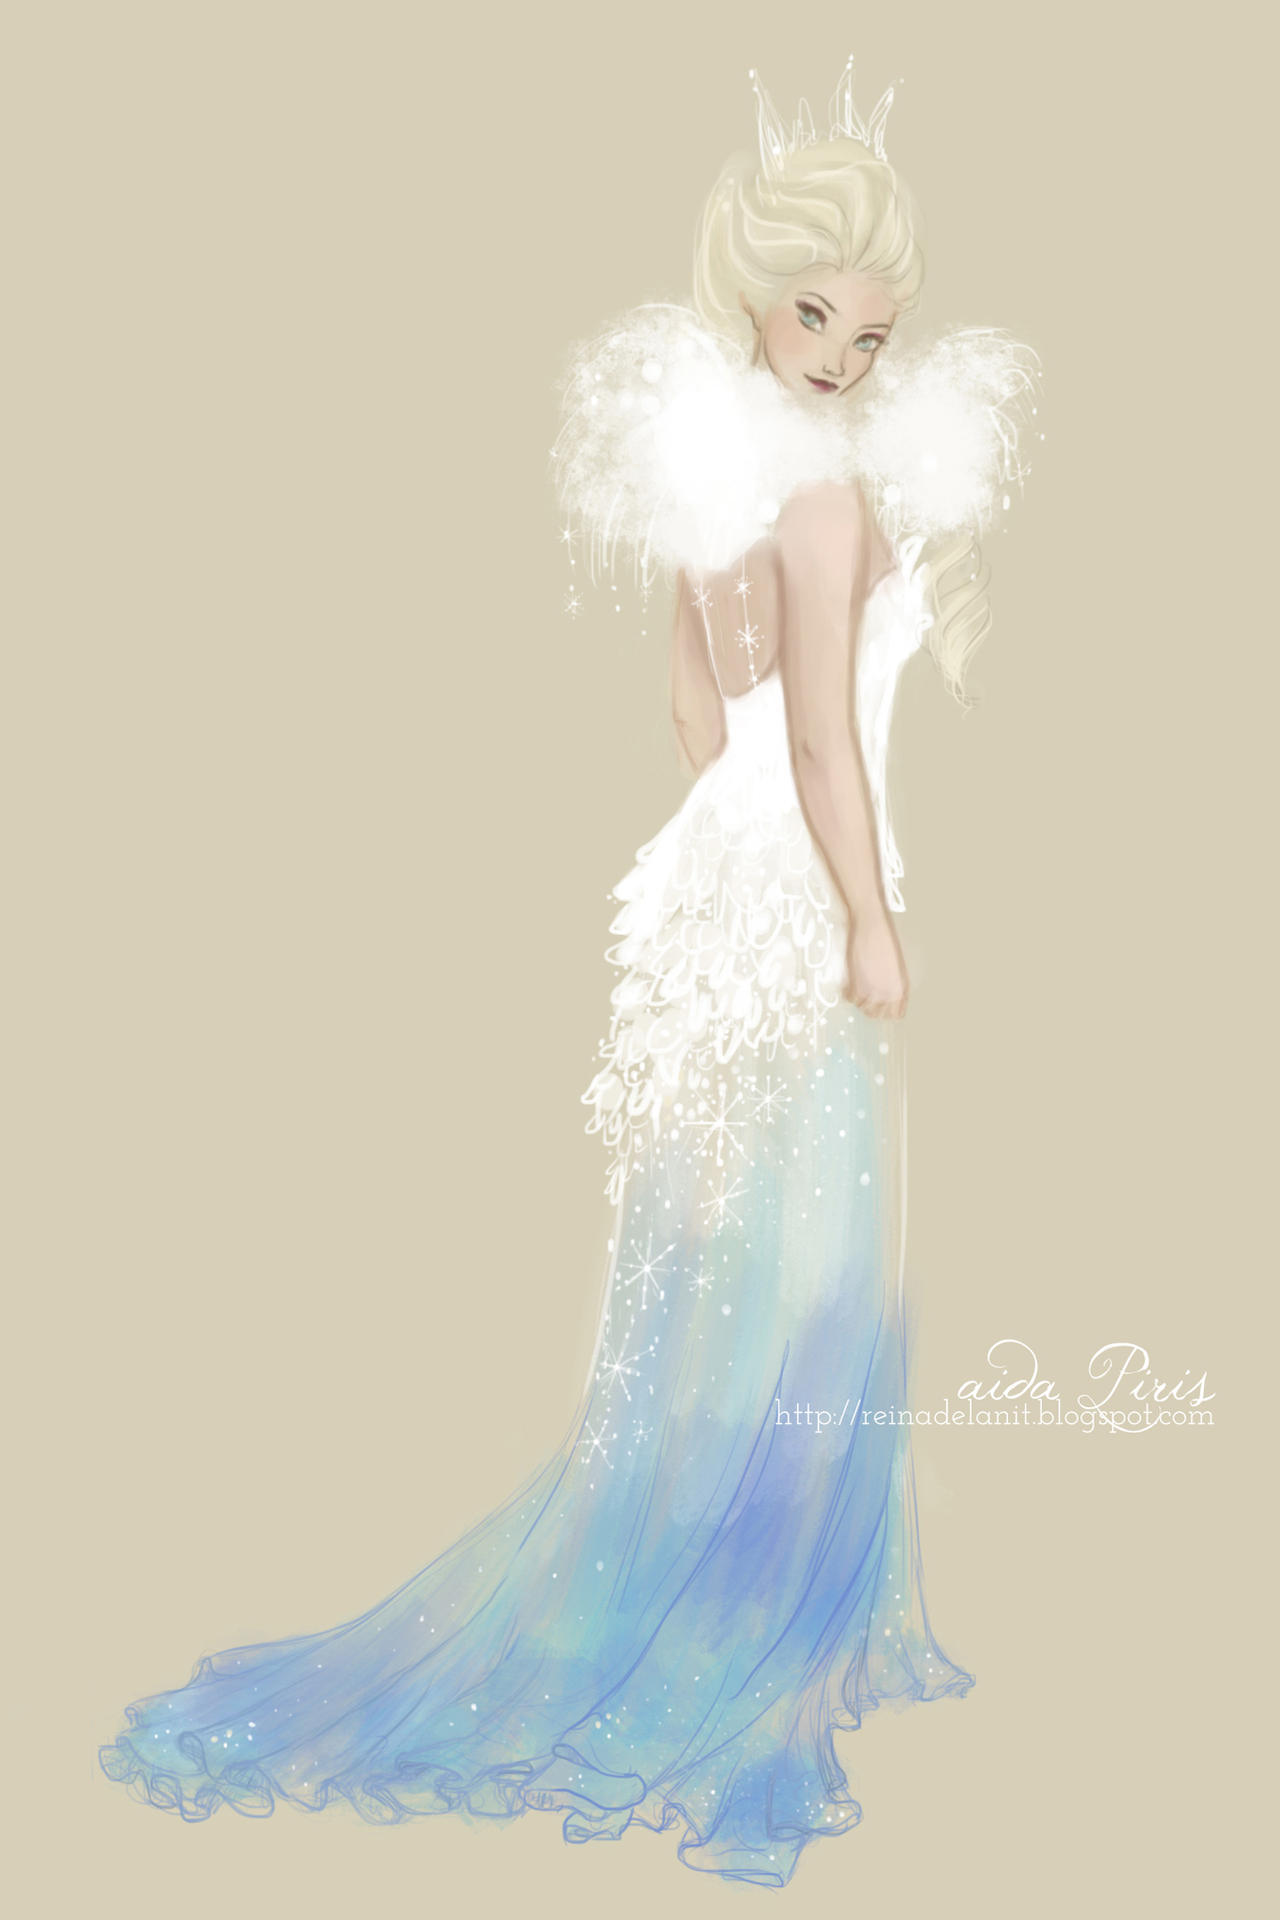 a dress for Elsa by Seleneprincess